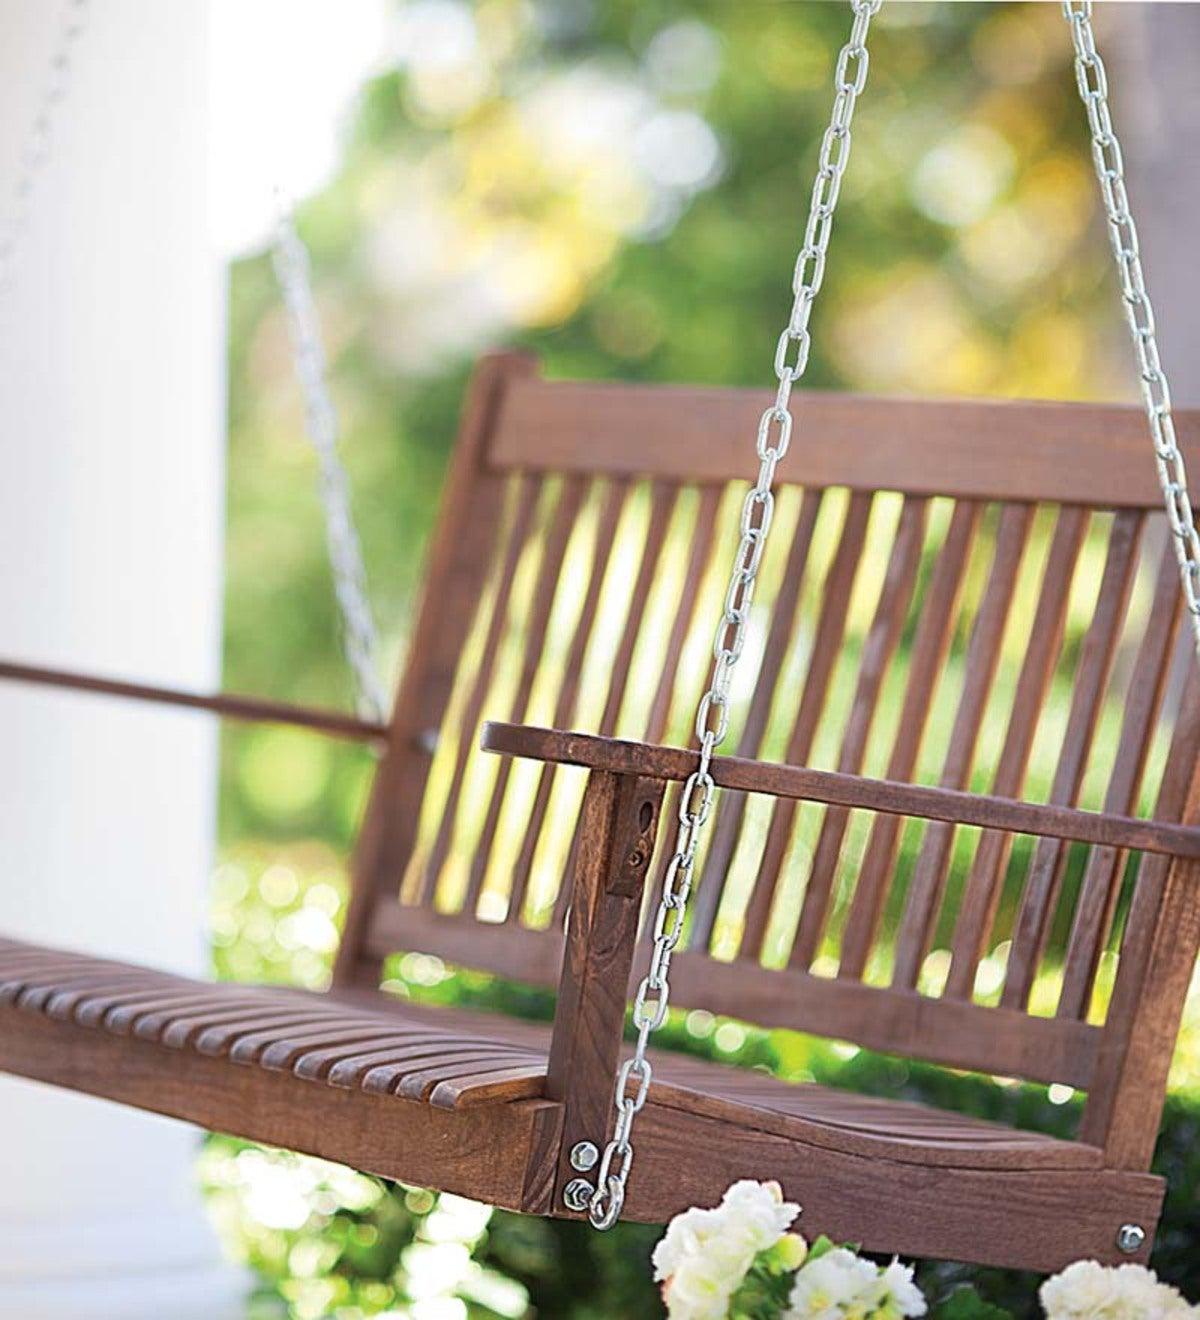 Classic Slatted Wood Porch Swing Classic Slatted